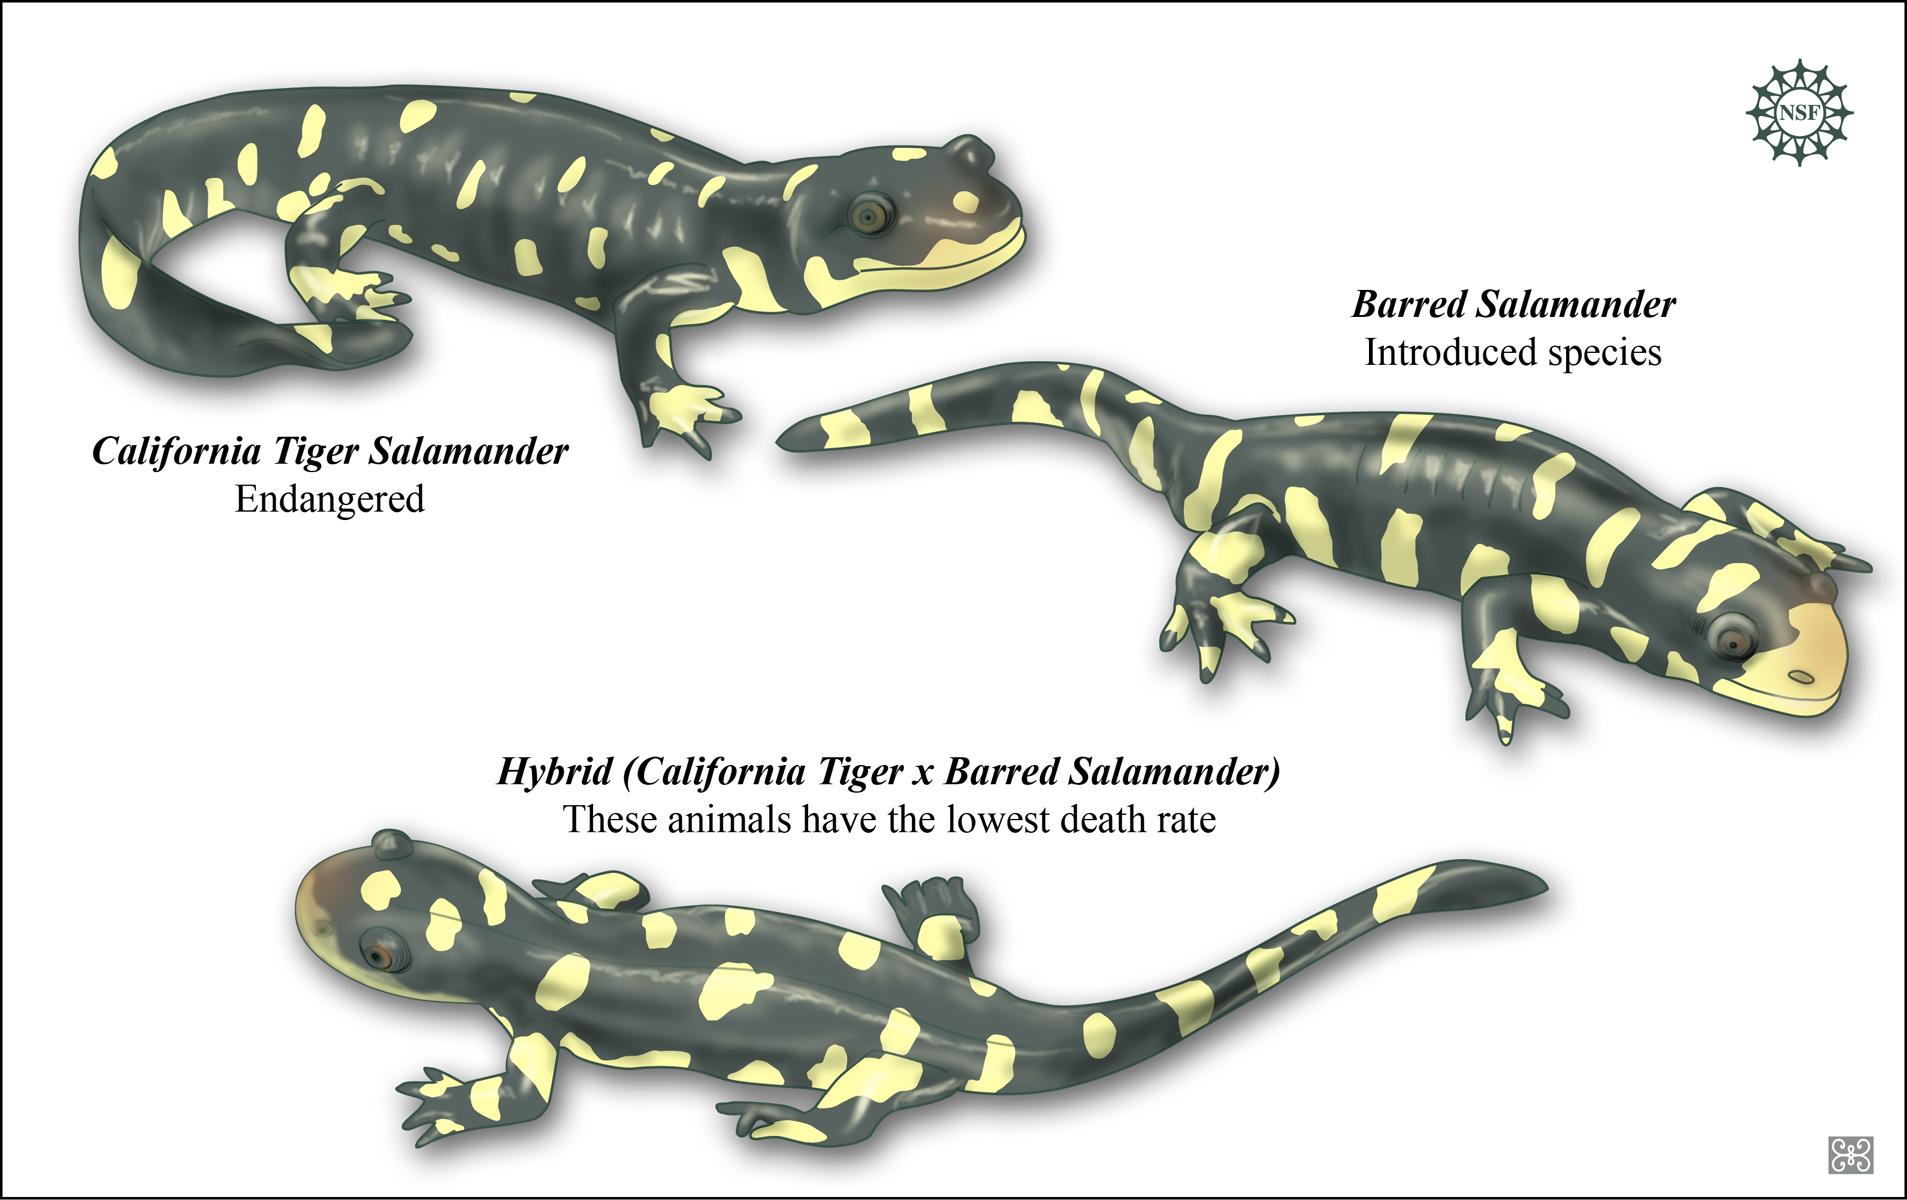 Interbreeding Between Invasive And Native Salamander Species Creates